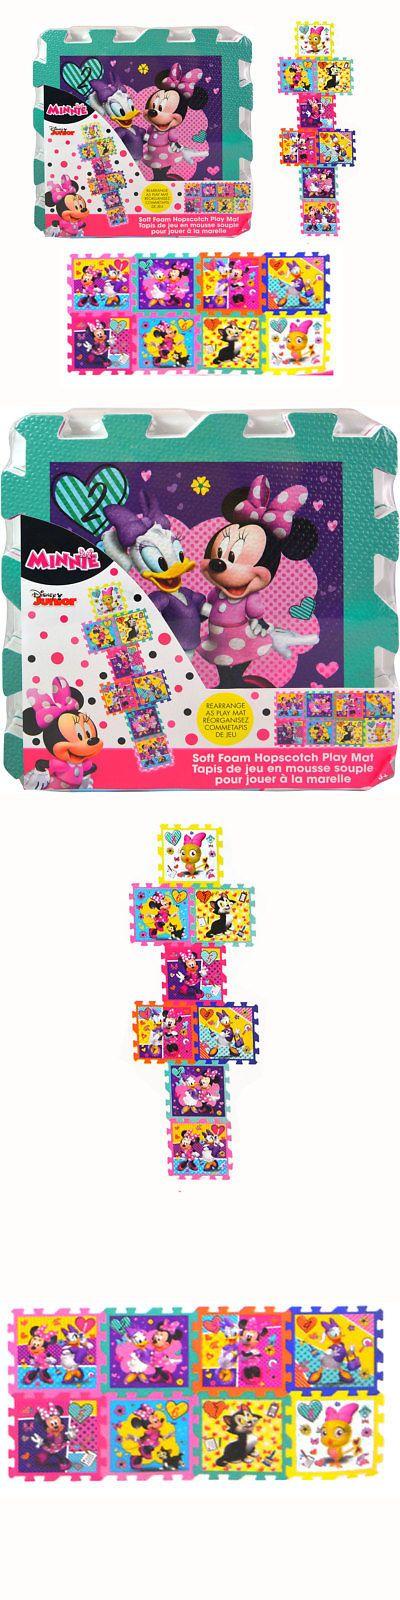 Minnie 19220 Disney Minnie Mouse Soft Foam Hopscotch Play Mat